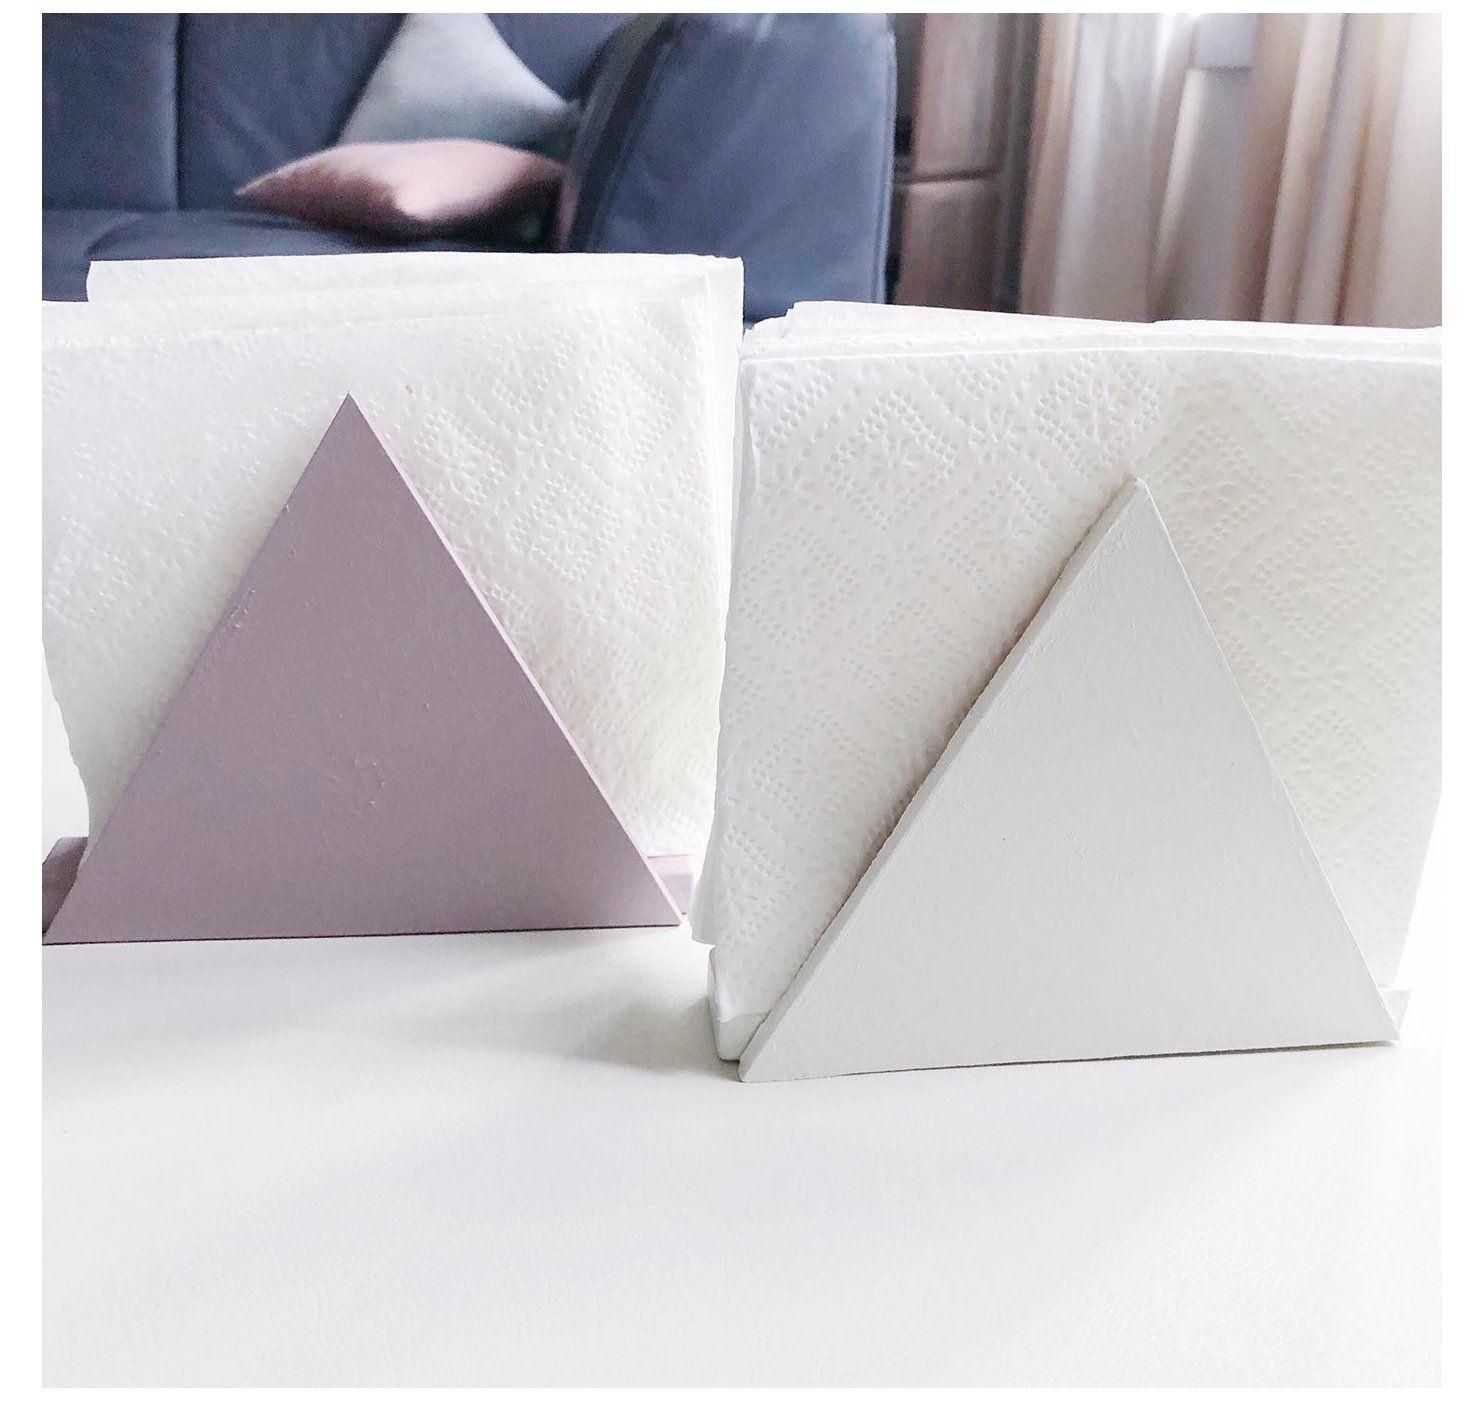 DIY Napkin holder #diy #homedecor #napkins DIY Napkin holder #diy #homedecor #napkins